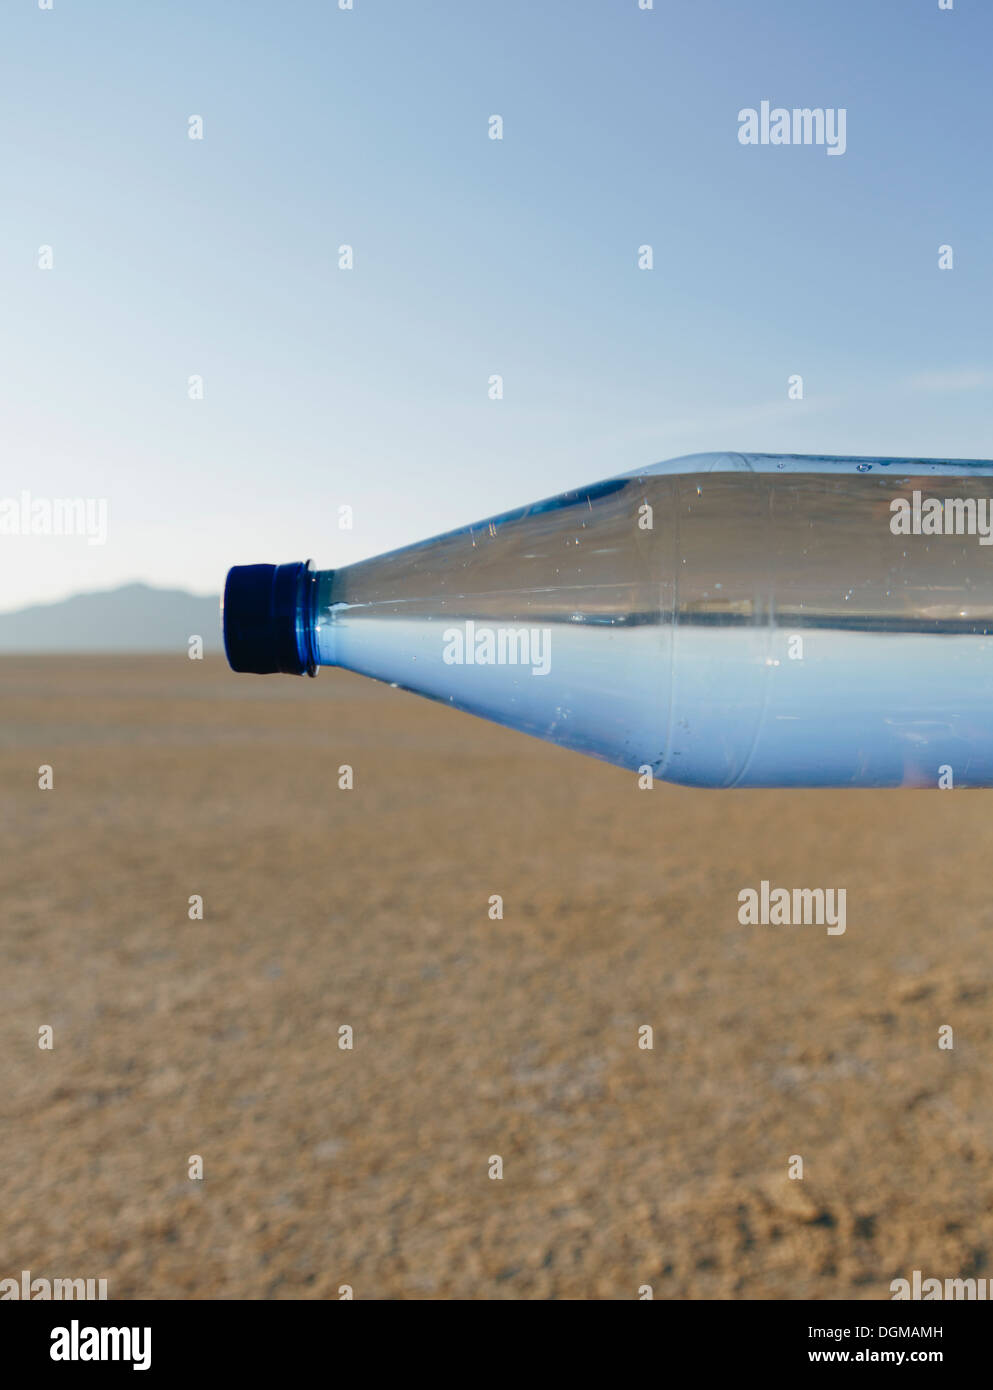 Desierto Black Rock de Nevada. Una botella de agua. Filtra agua mineral. Lateralmente. El nivel del agua coincide con el horizonte. Imagen De Stock